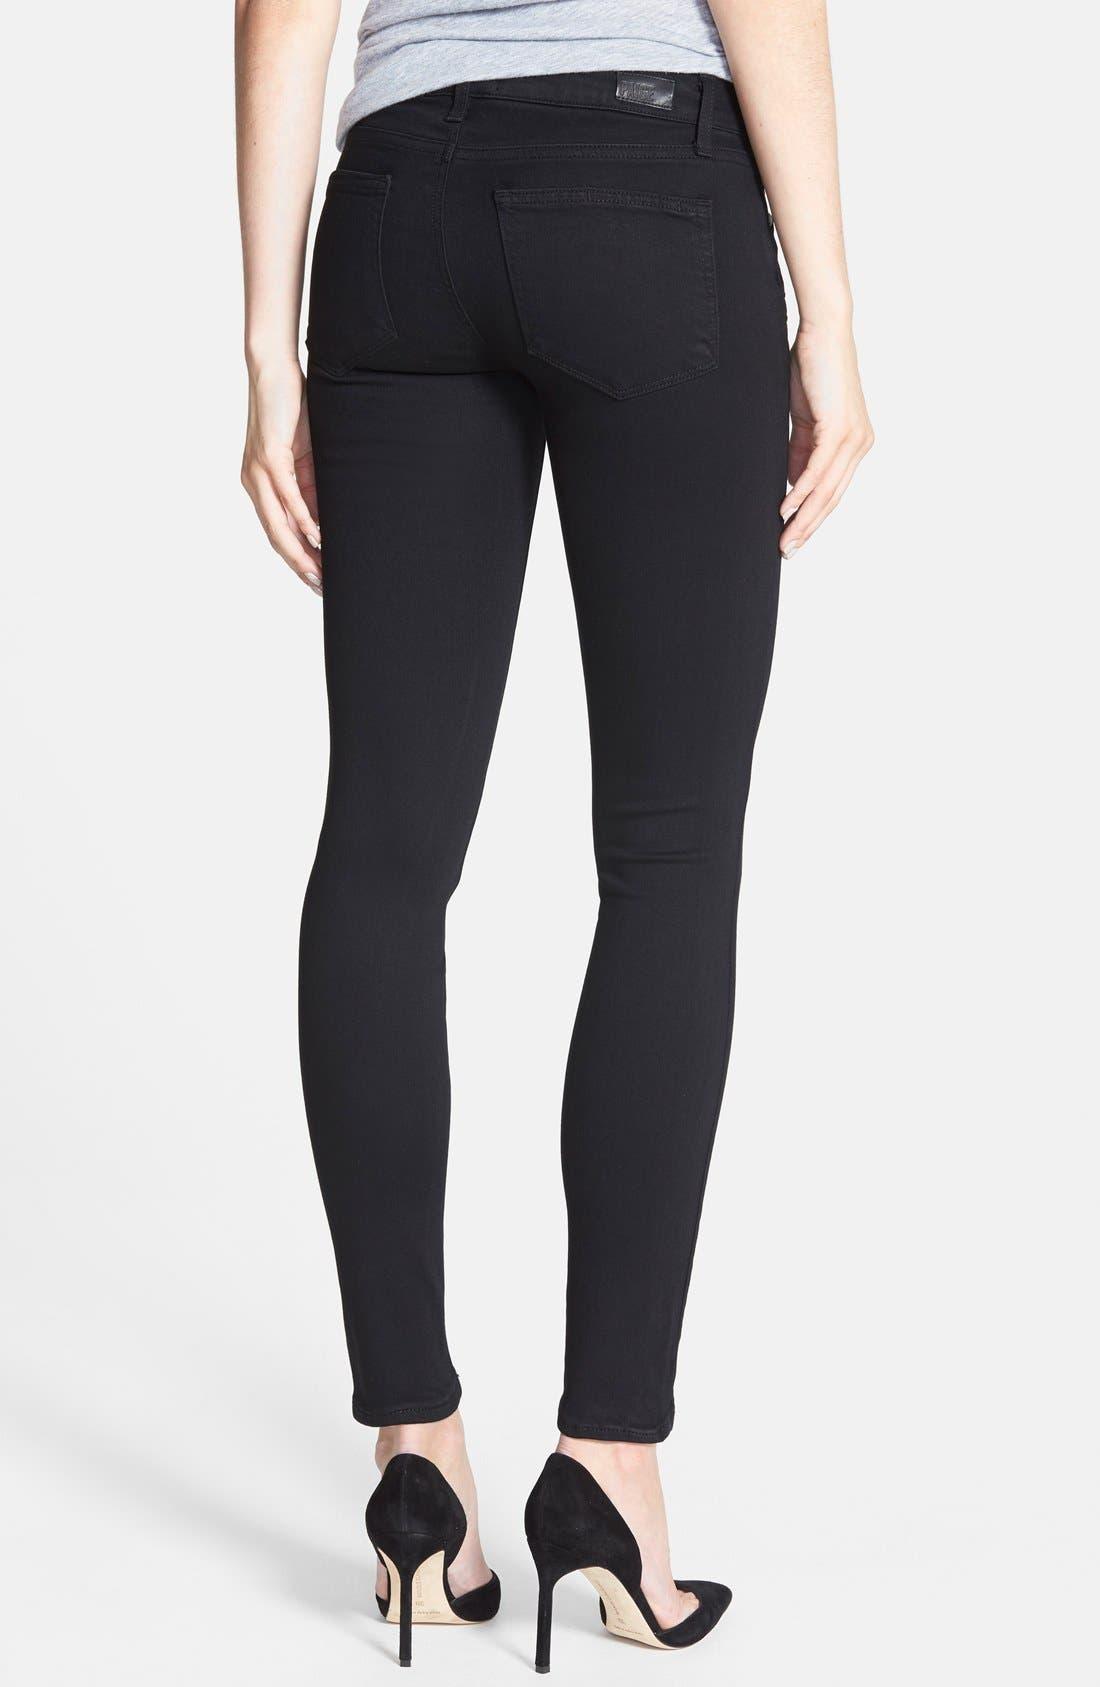 Transcend - Edgemont Ultra Skinny Jeans,                             Alternate thumbnail 2, color,                             BLACK SHADOW